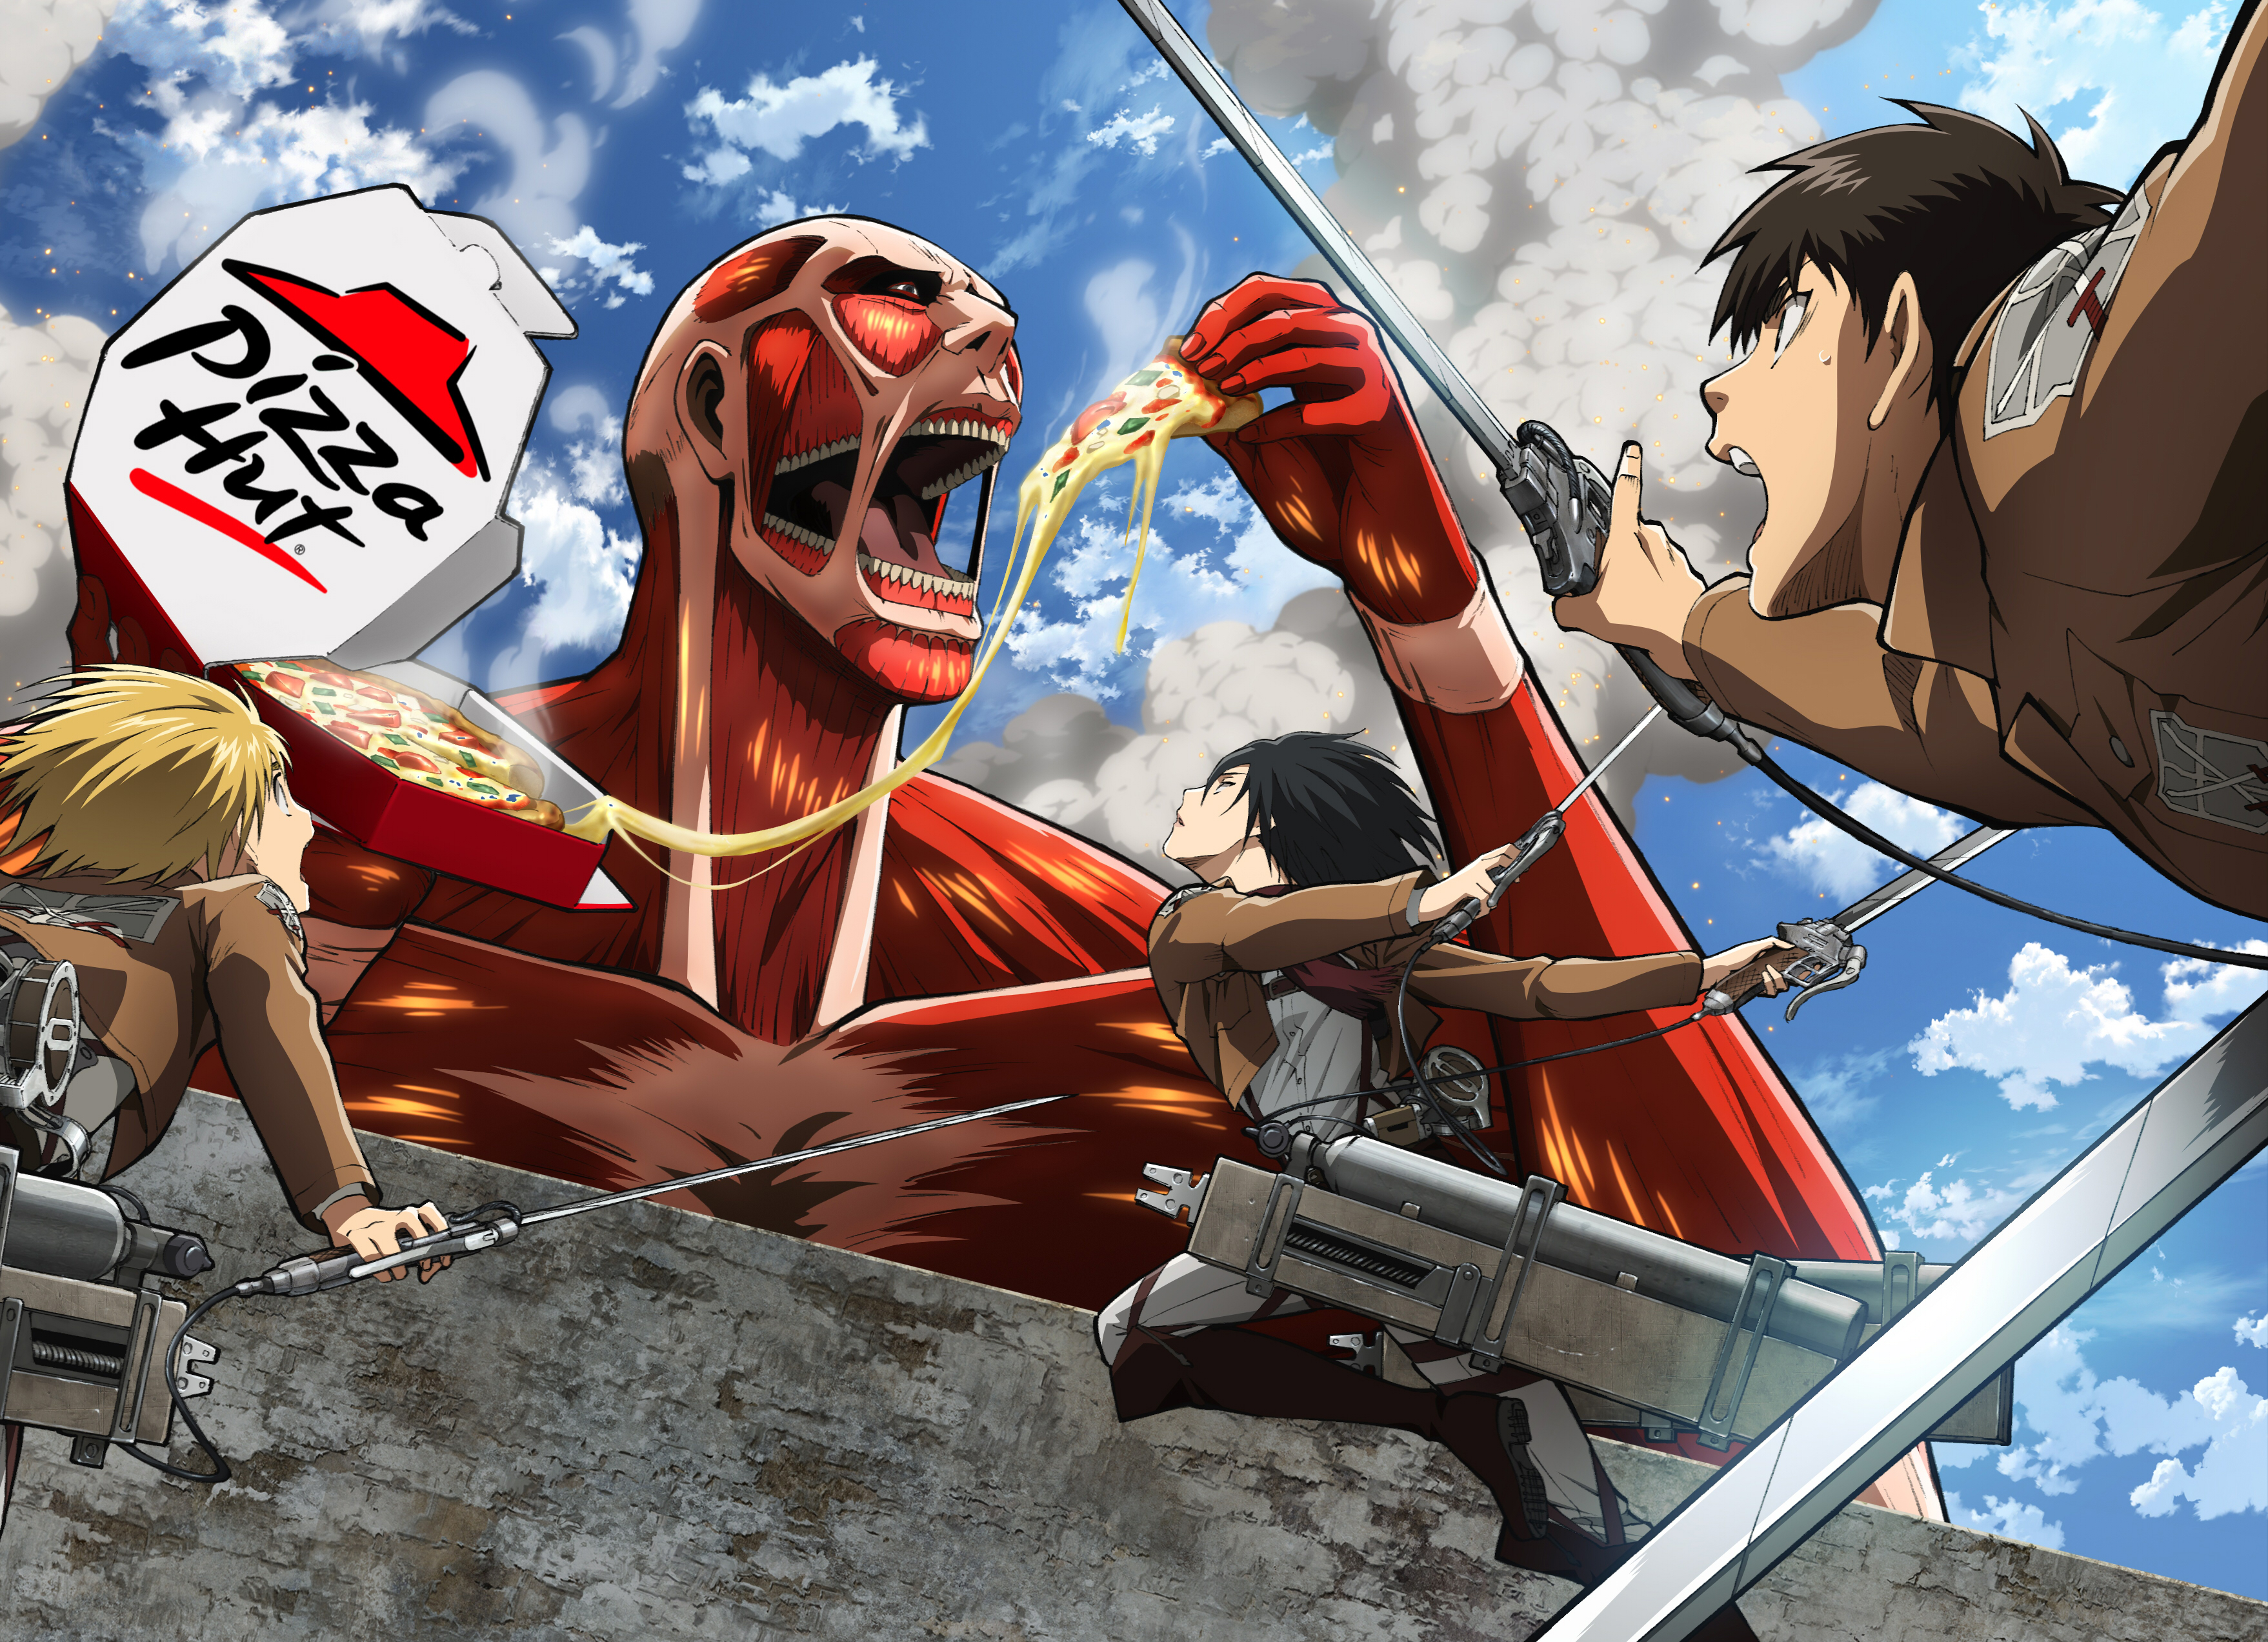 Armin Arlert Attack On Titan Eren Yeager Mikasa Ackerman Pizza Hut Shingeki No Kyojin Wallpaper Resolution 3515x2545 Id 773348 Wallha Com